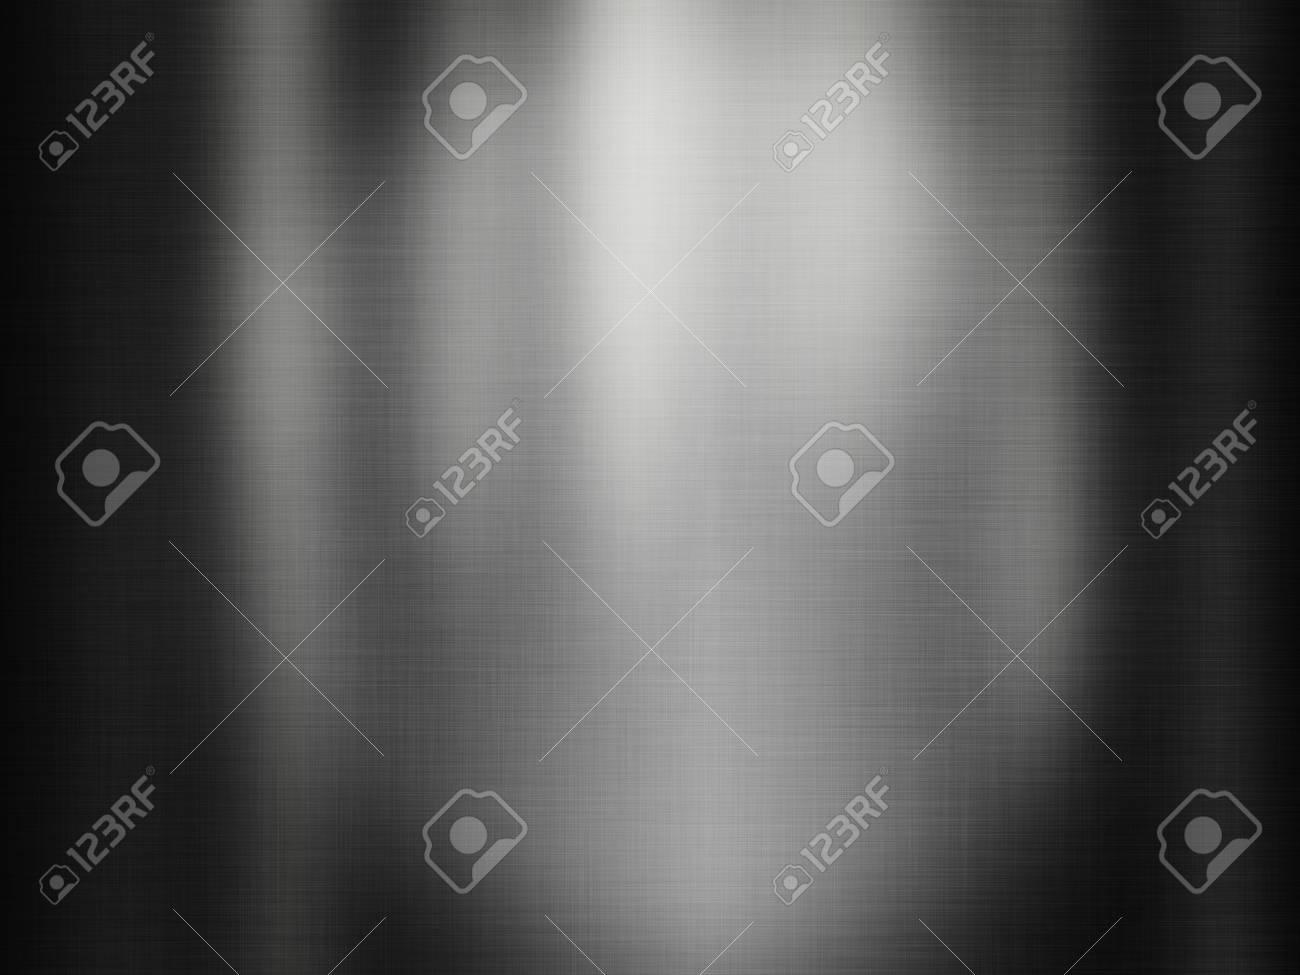 texture en acier inoxydable ou en métal texture de fond Banque d'images - 75076765